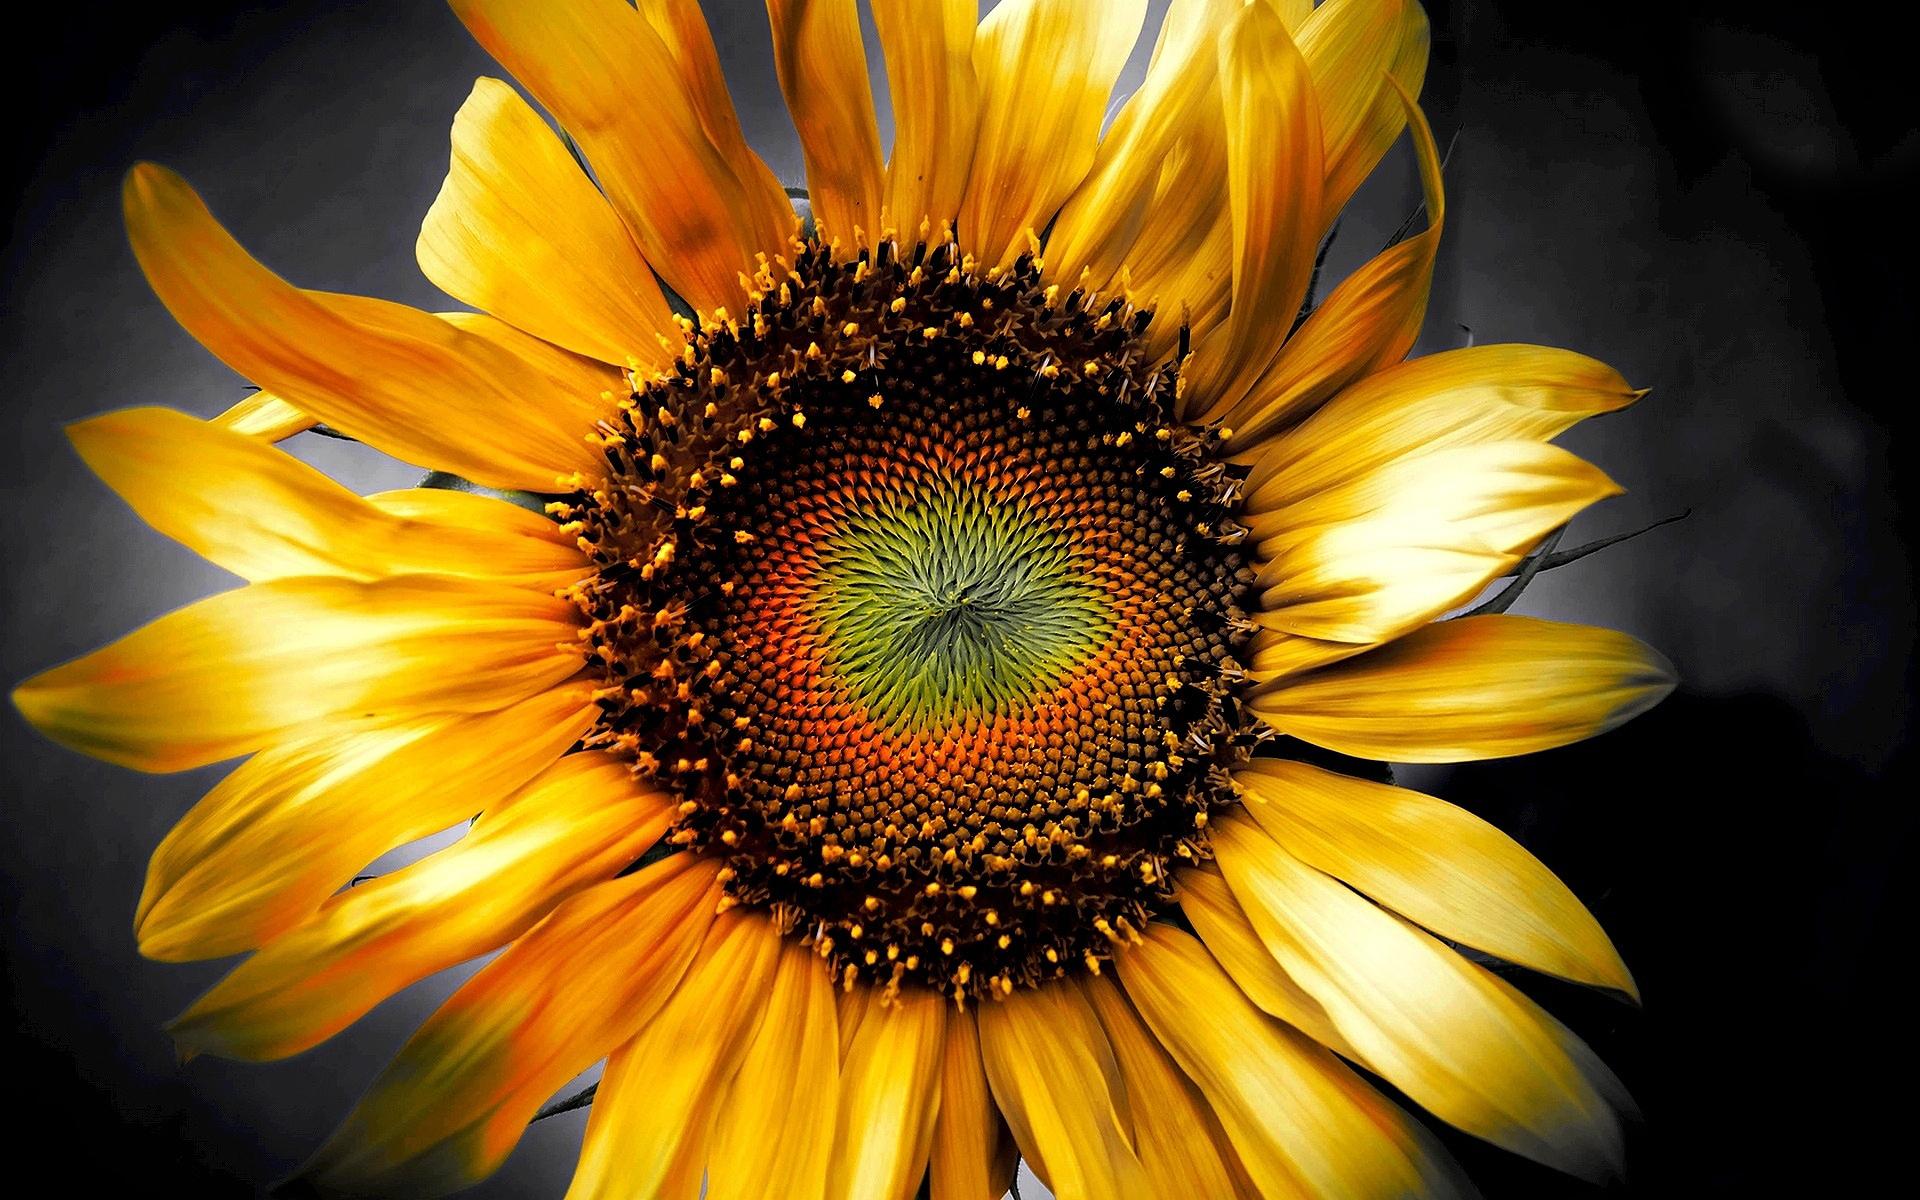 Sunflower-art-3d.jpg